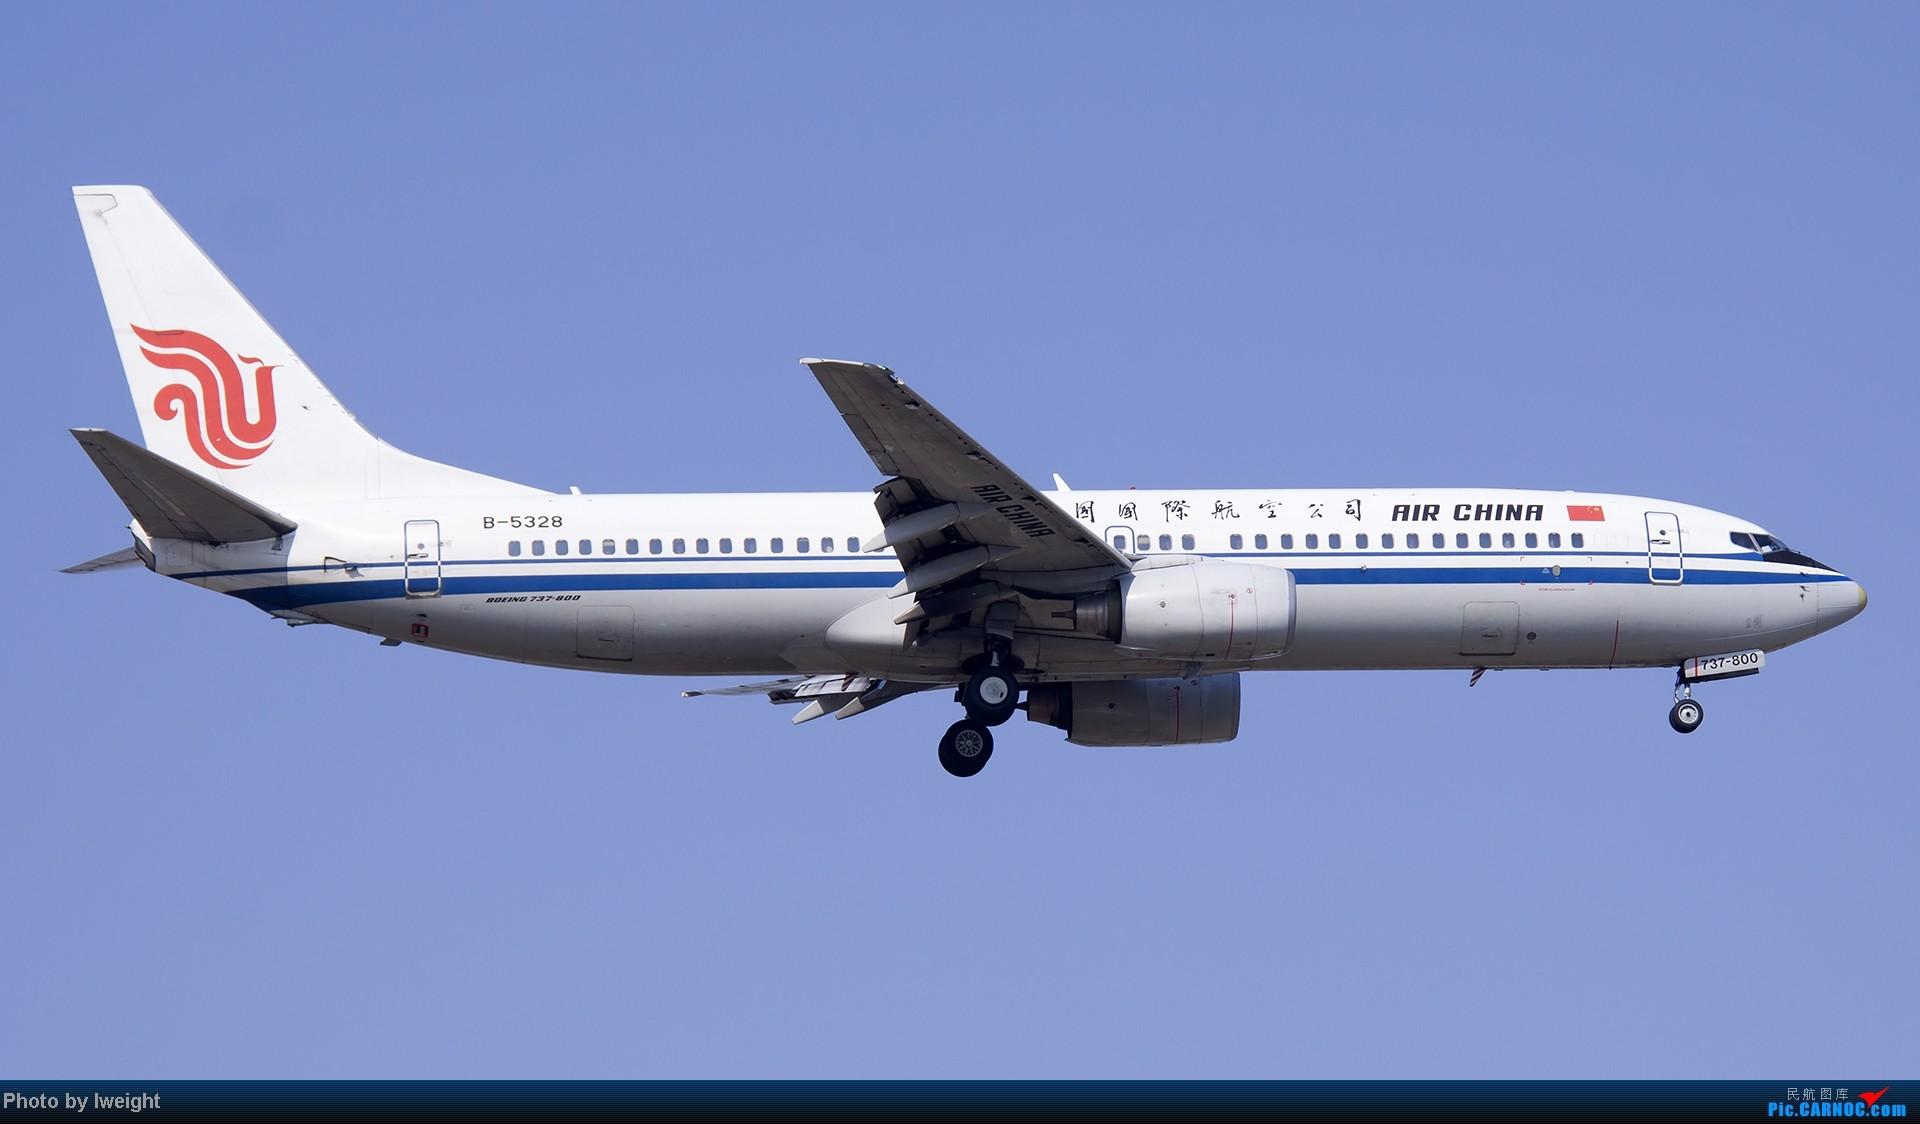 Re:[原创]北京难得的好天气,收获多种机型和彩绘,遗憾的是再次错过卡航巴塞罗那彩绘 BOEING 737-800 B-5328 中国北京首都机场